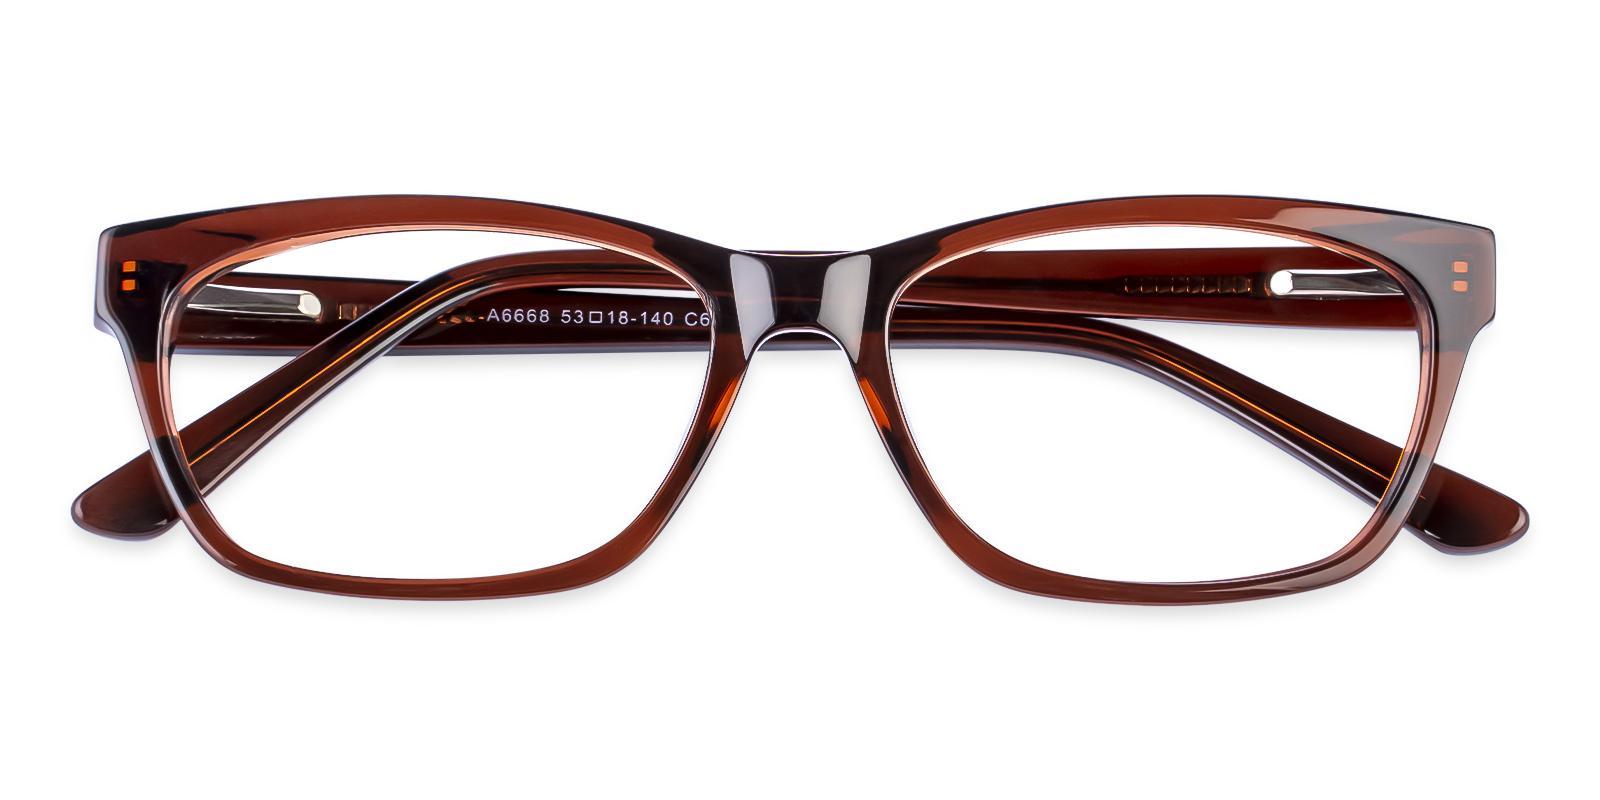 Demain Brown Acetate Eyeglasses , SpringHinges , UniversalBridgeFit Frames from ABBE Glasses